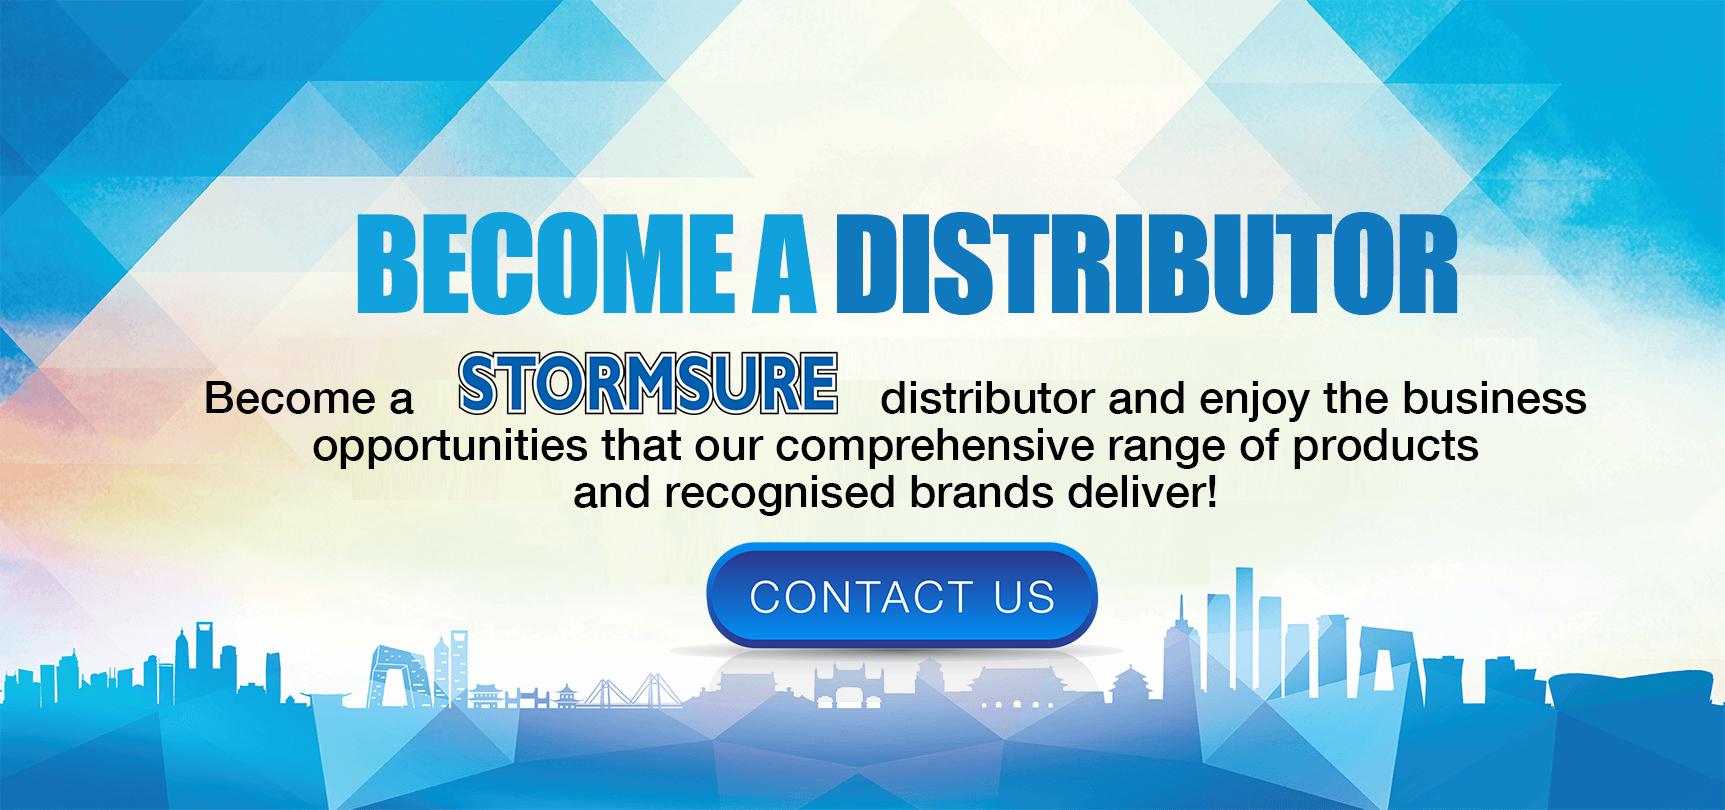 Become a Stormsure Distributor